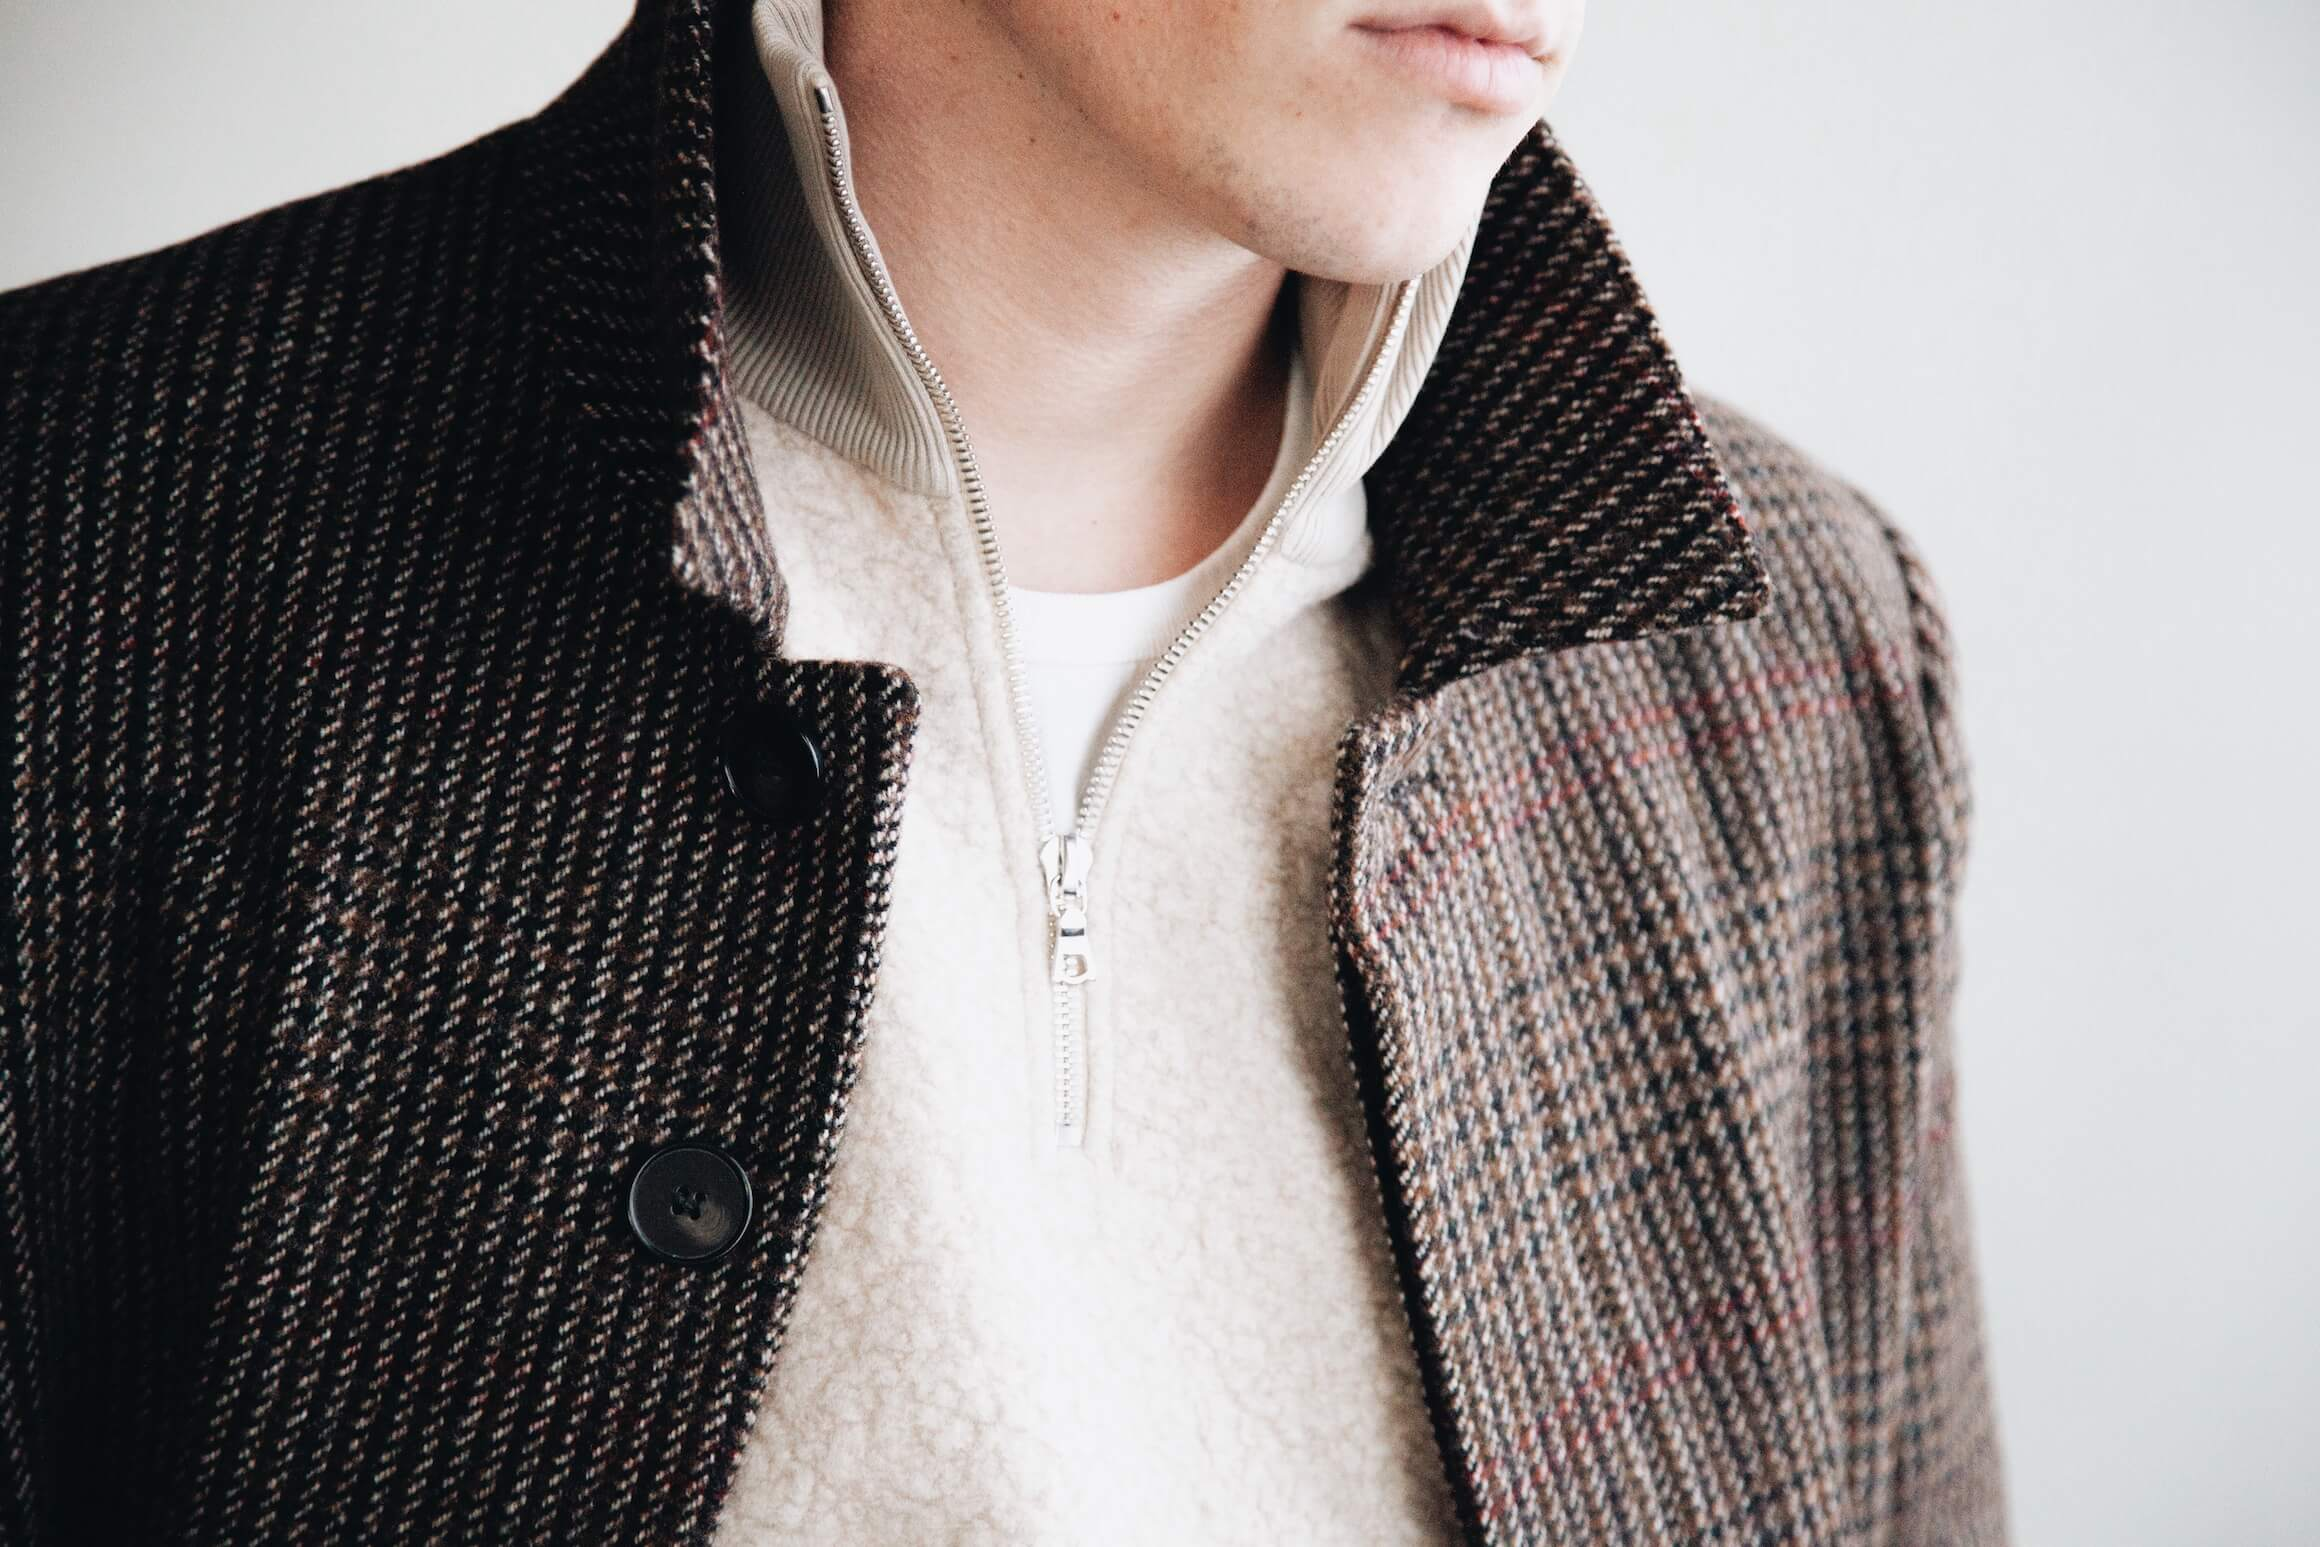 harmony paris maximus overcoat and sergio sweatshirt on body